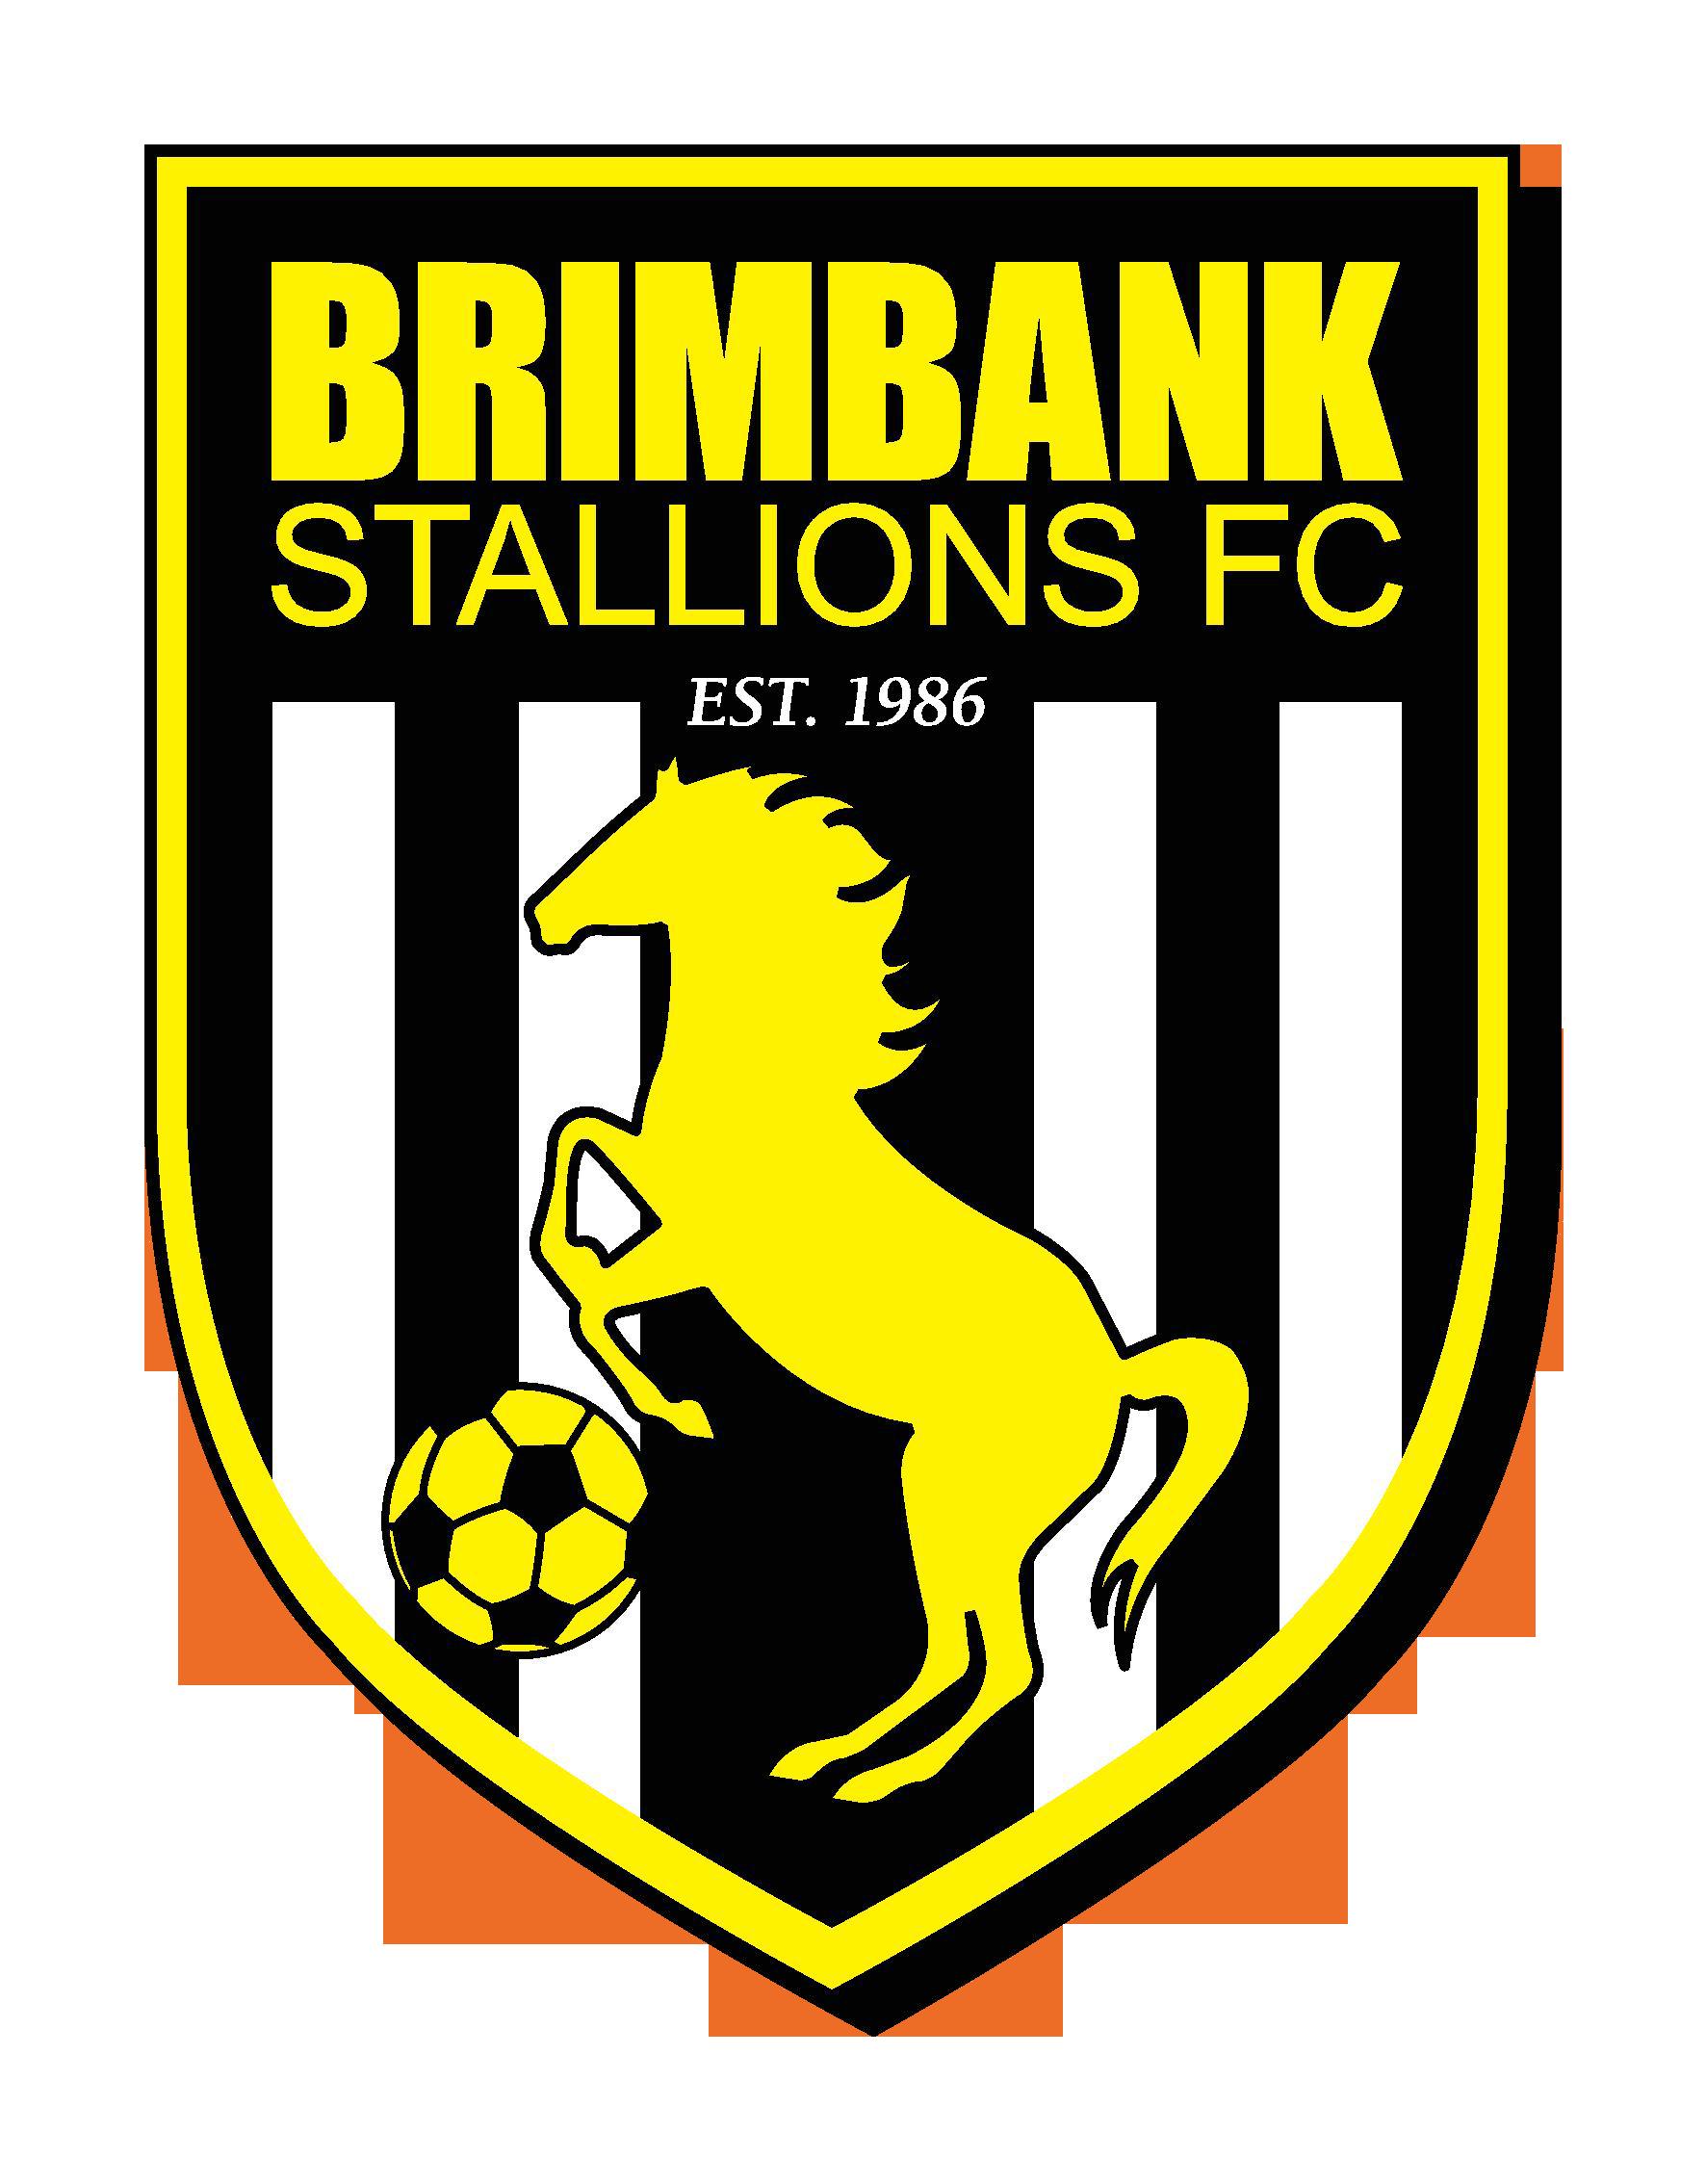 Brimbank Stallions